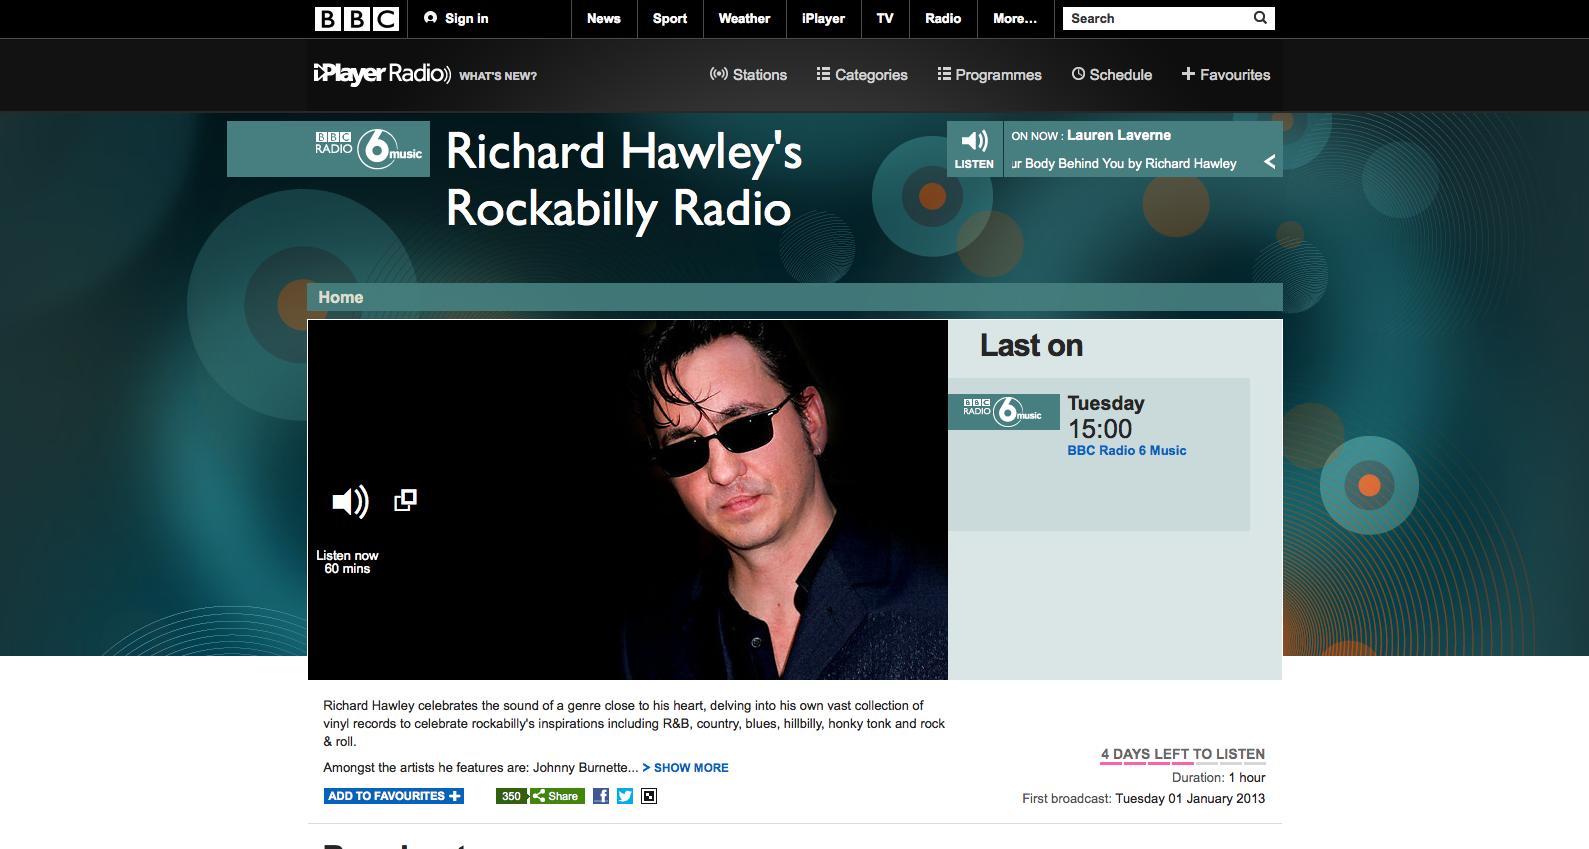 Richard Hawley's Rockabilly Radio Show